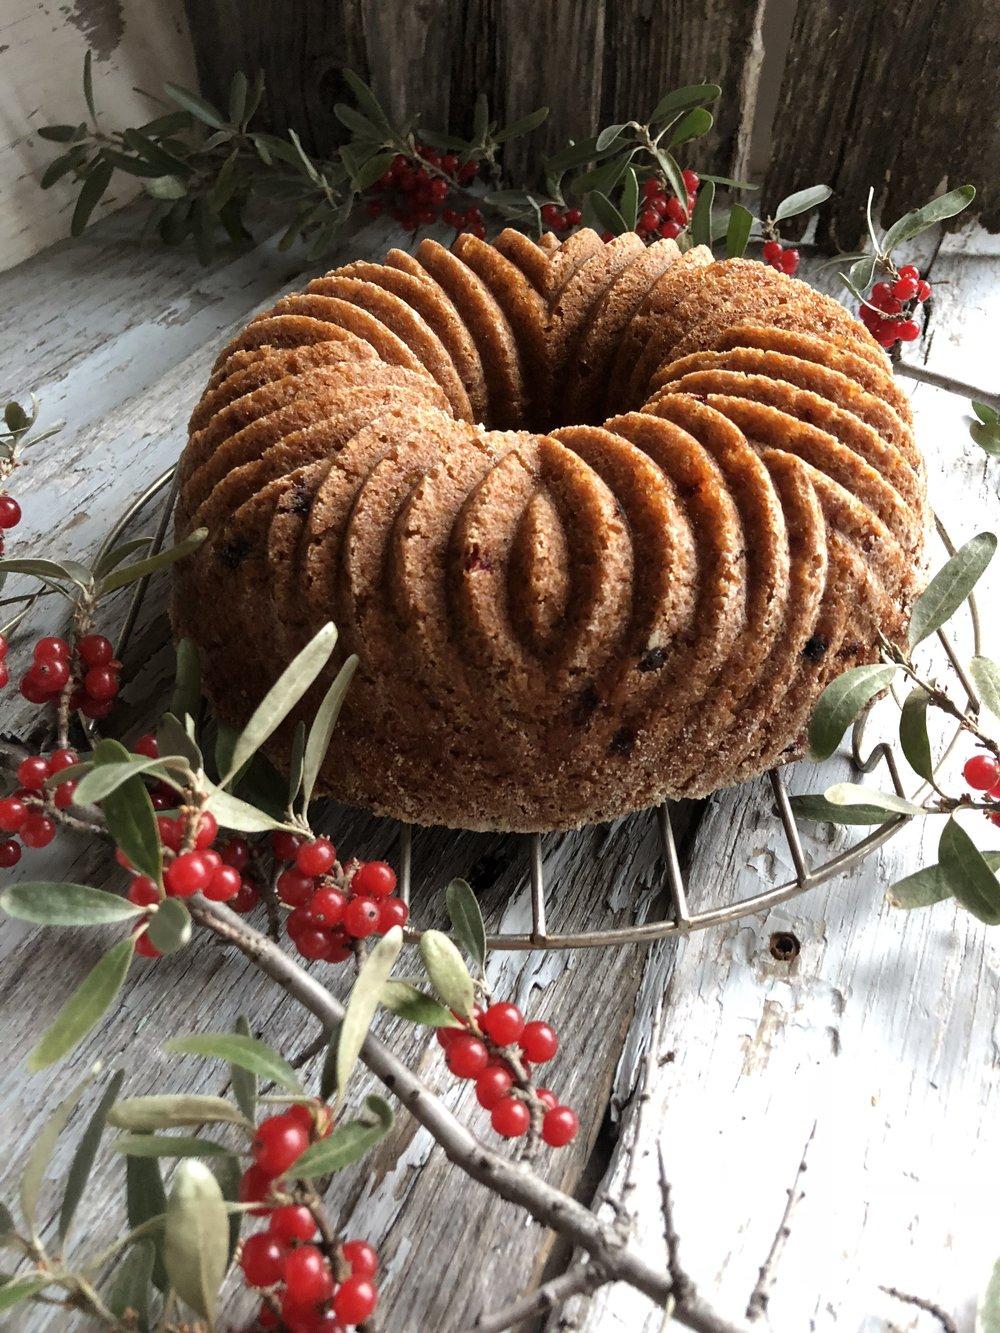 gluten free bundt cake with pumpkin and buffalo berries